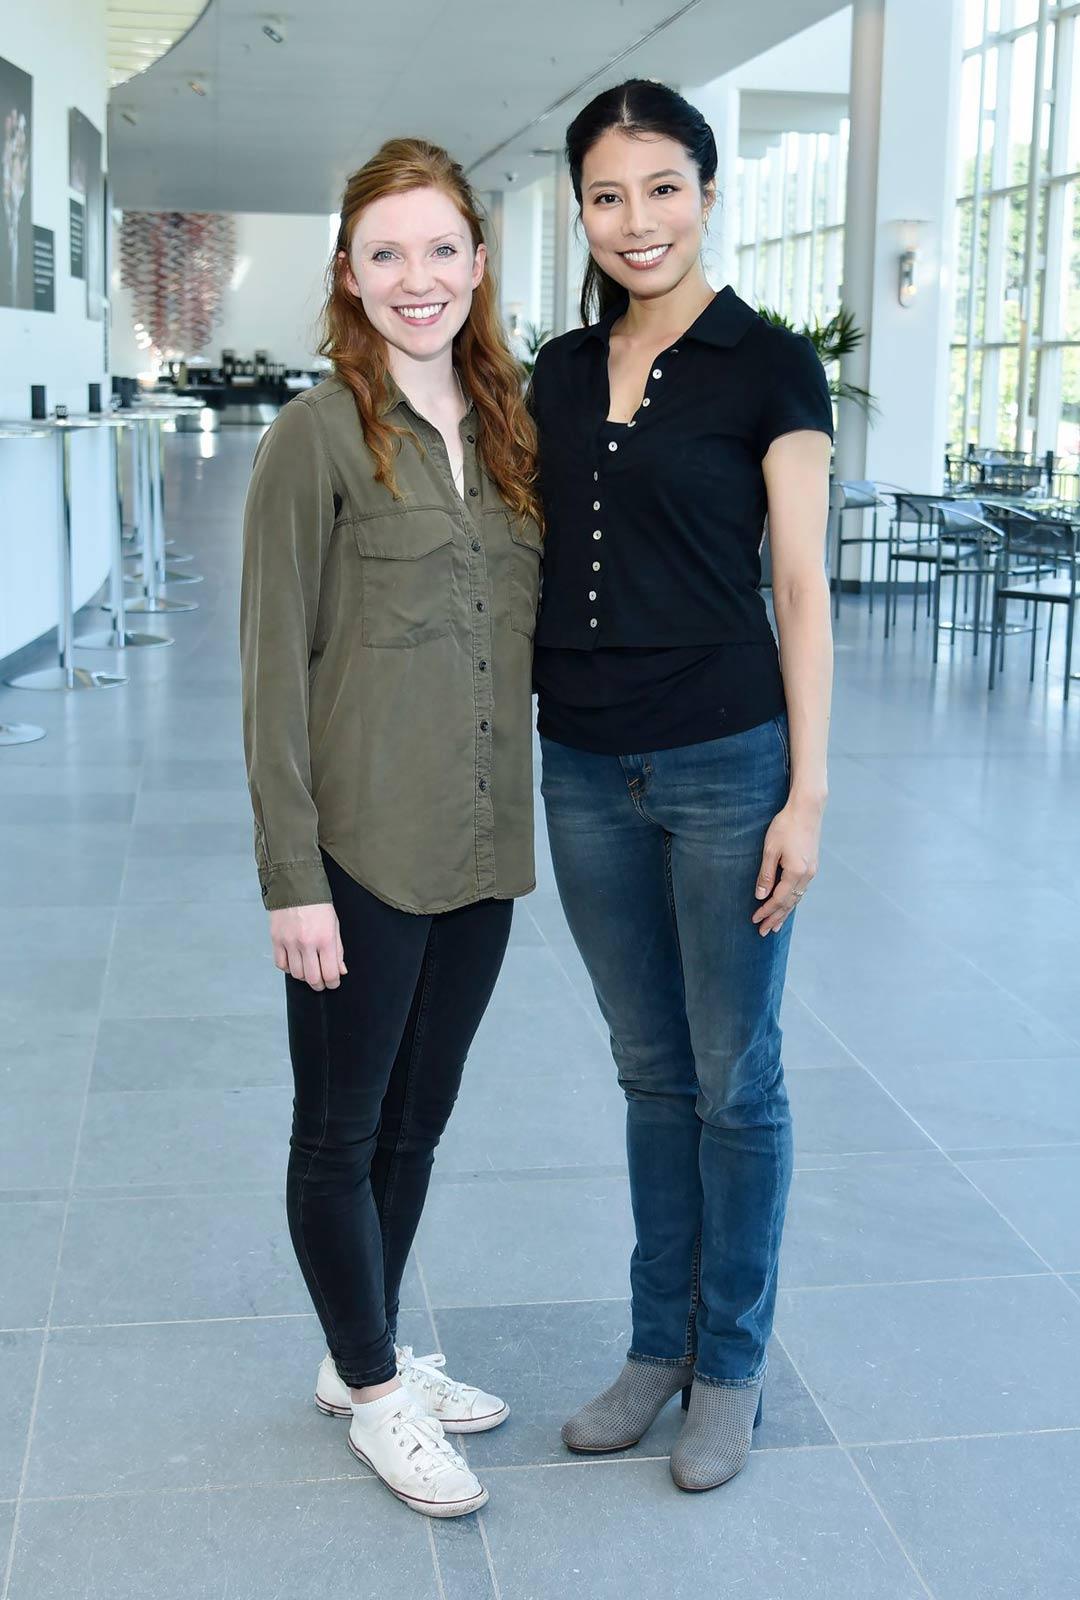 Ensitanssijat Abigail Sheppard ja Hanako Matsune.